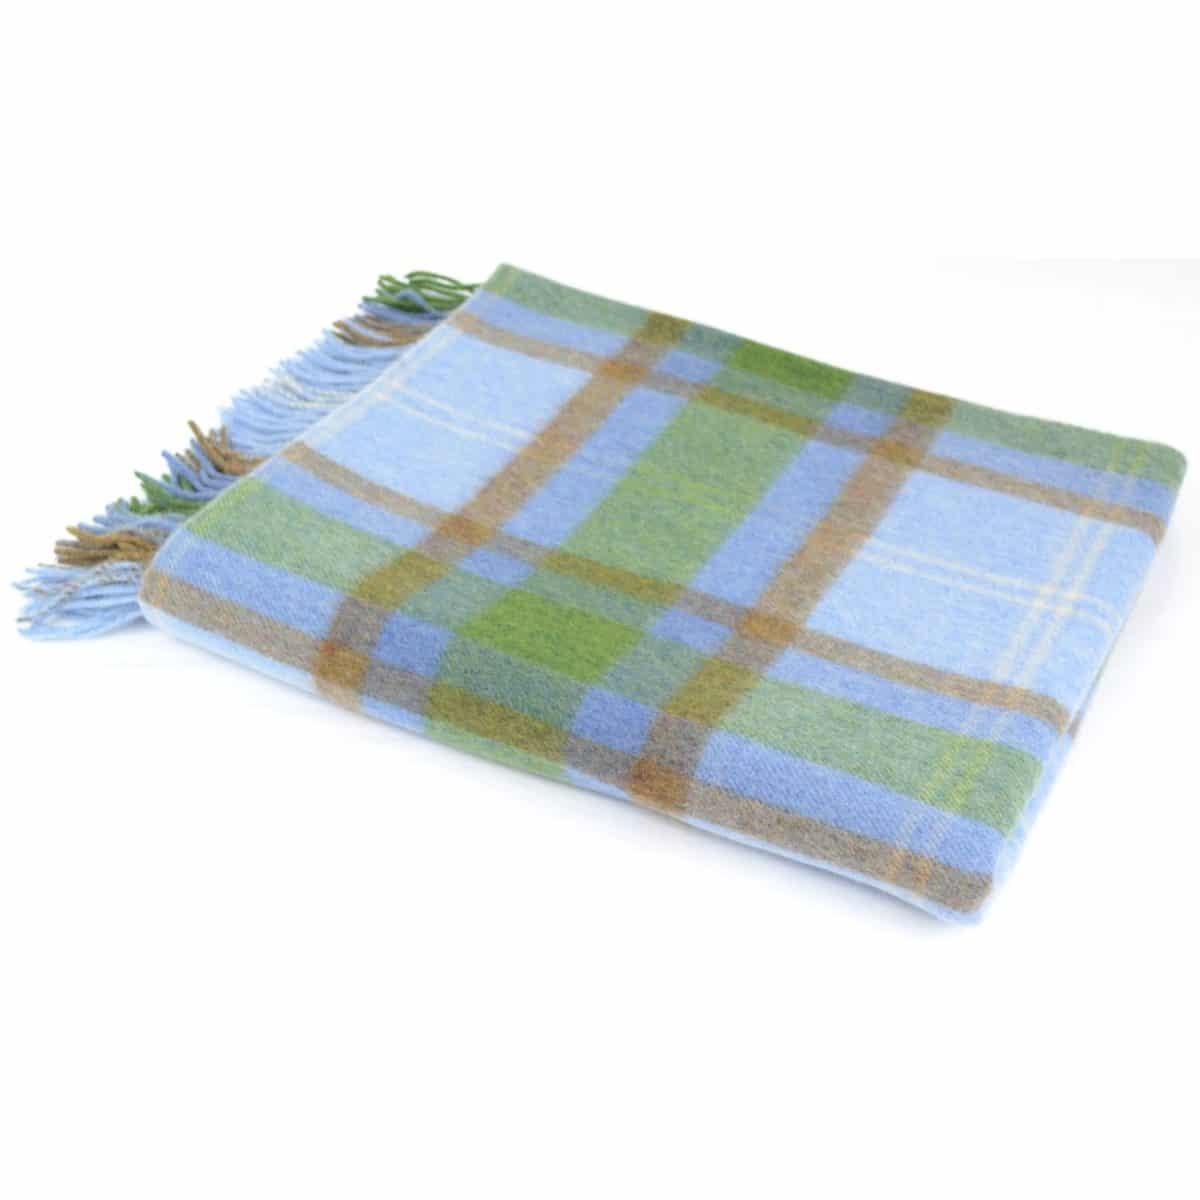 Lambswool Blanket / Throw - Cornflower Blue